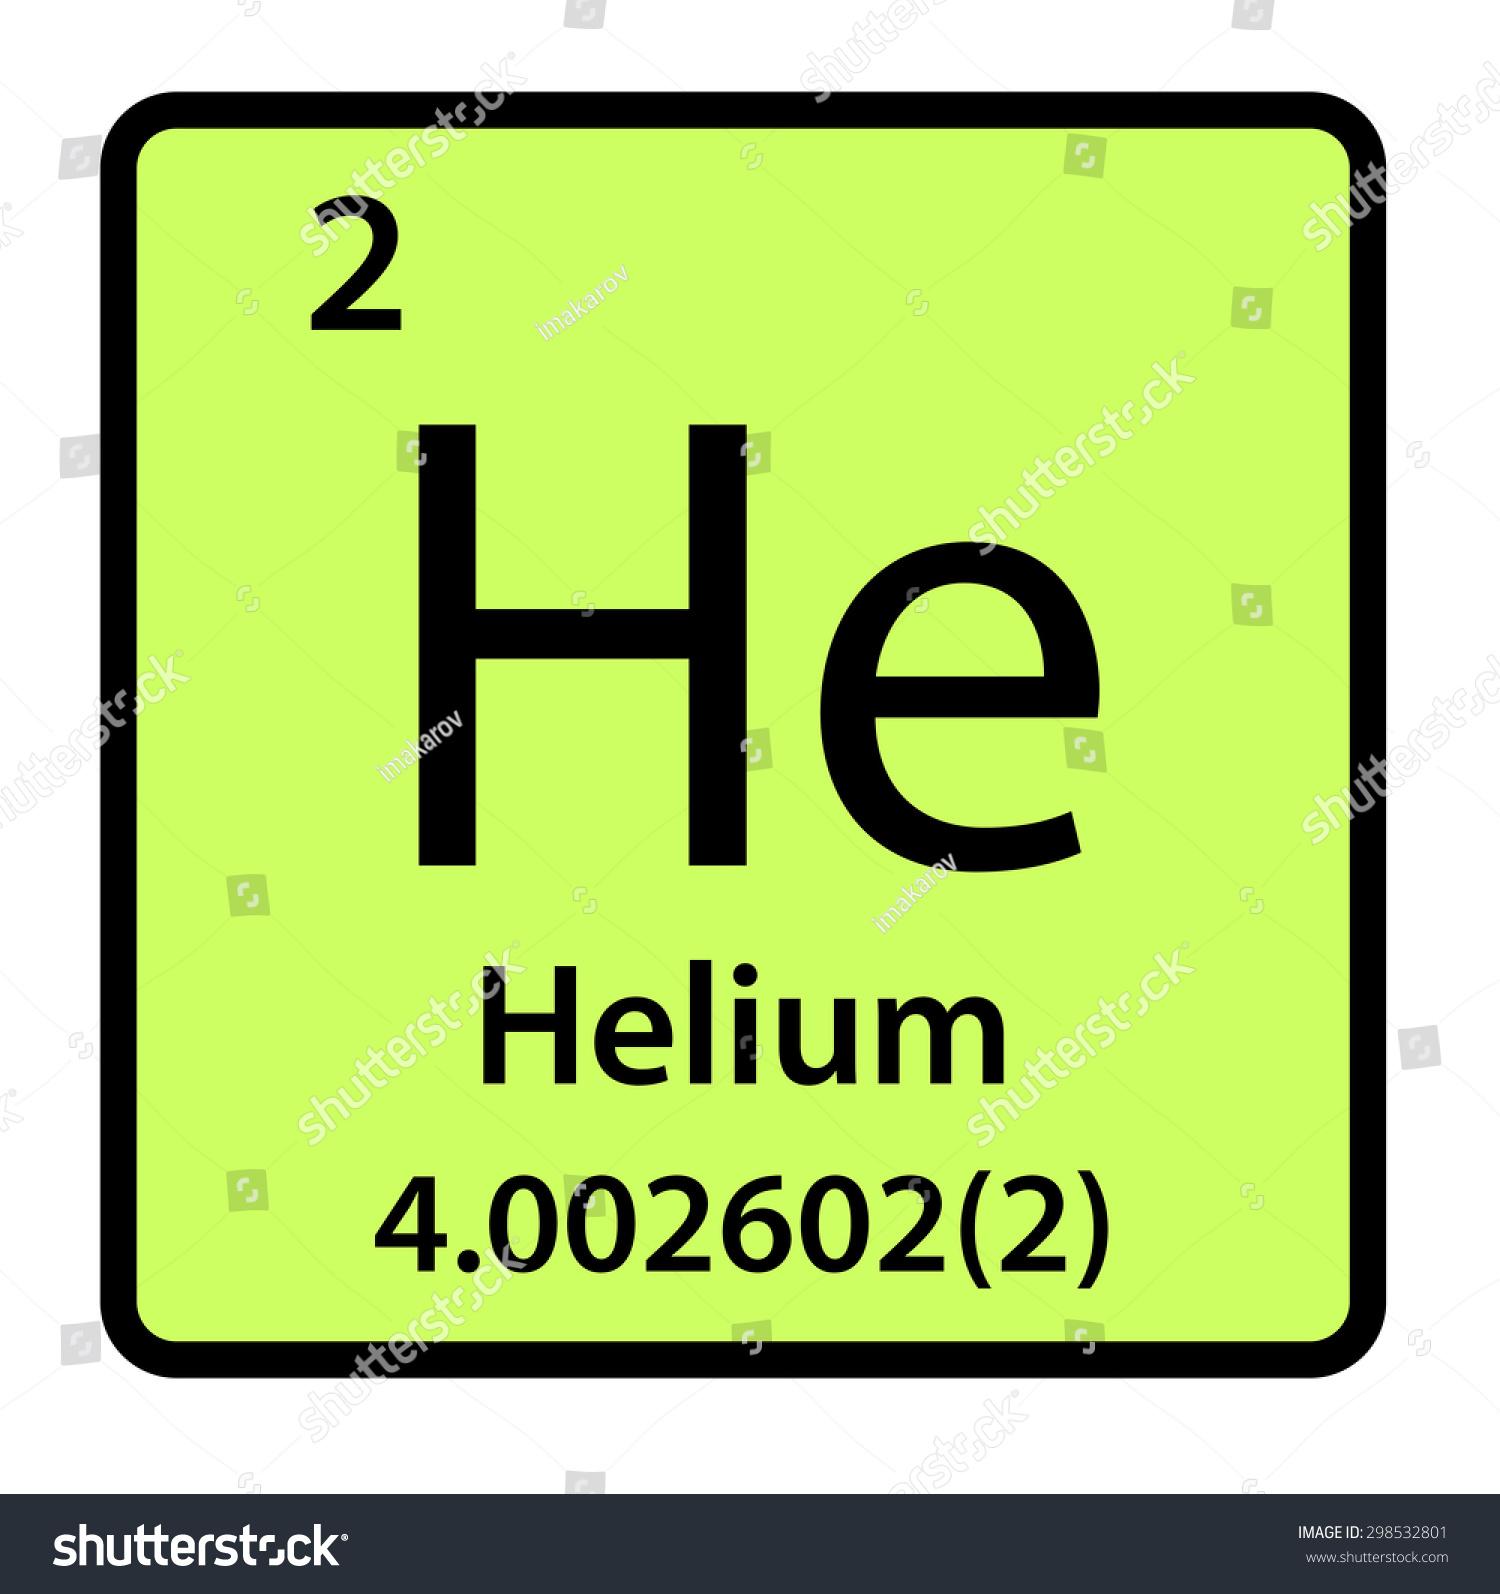 Element helium periodic table stock illustration 298532801 element helium of the periodic table gamestrikefo Gallery